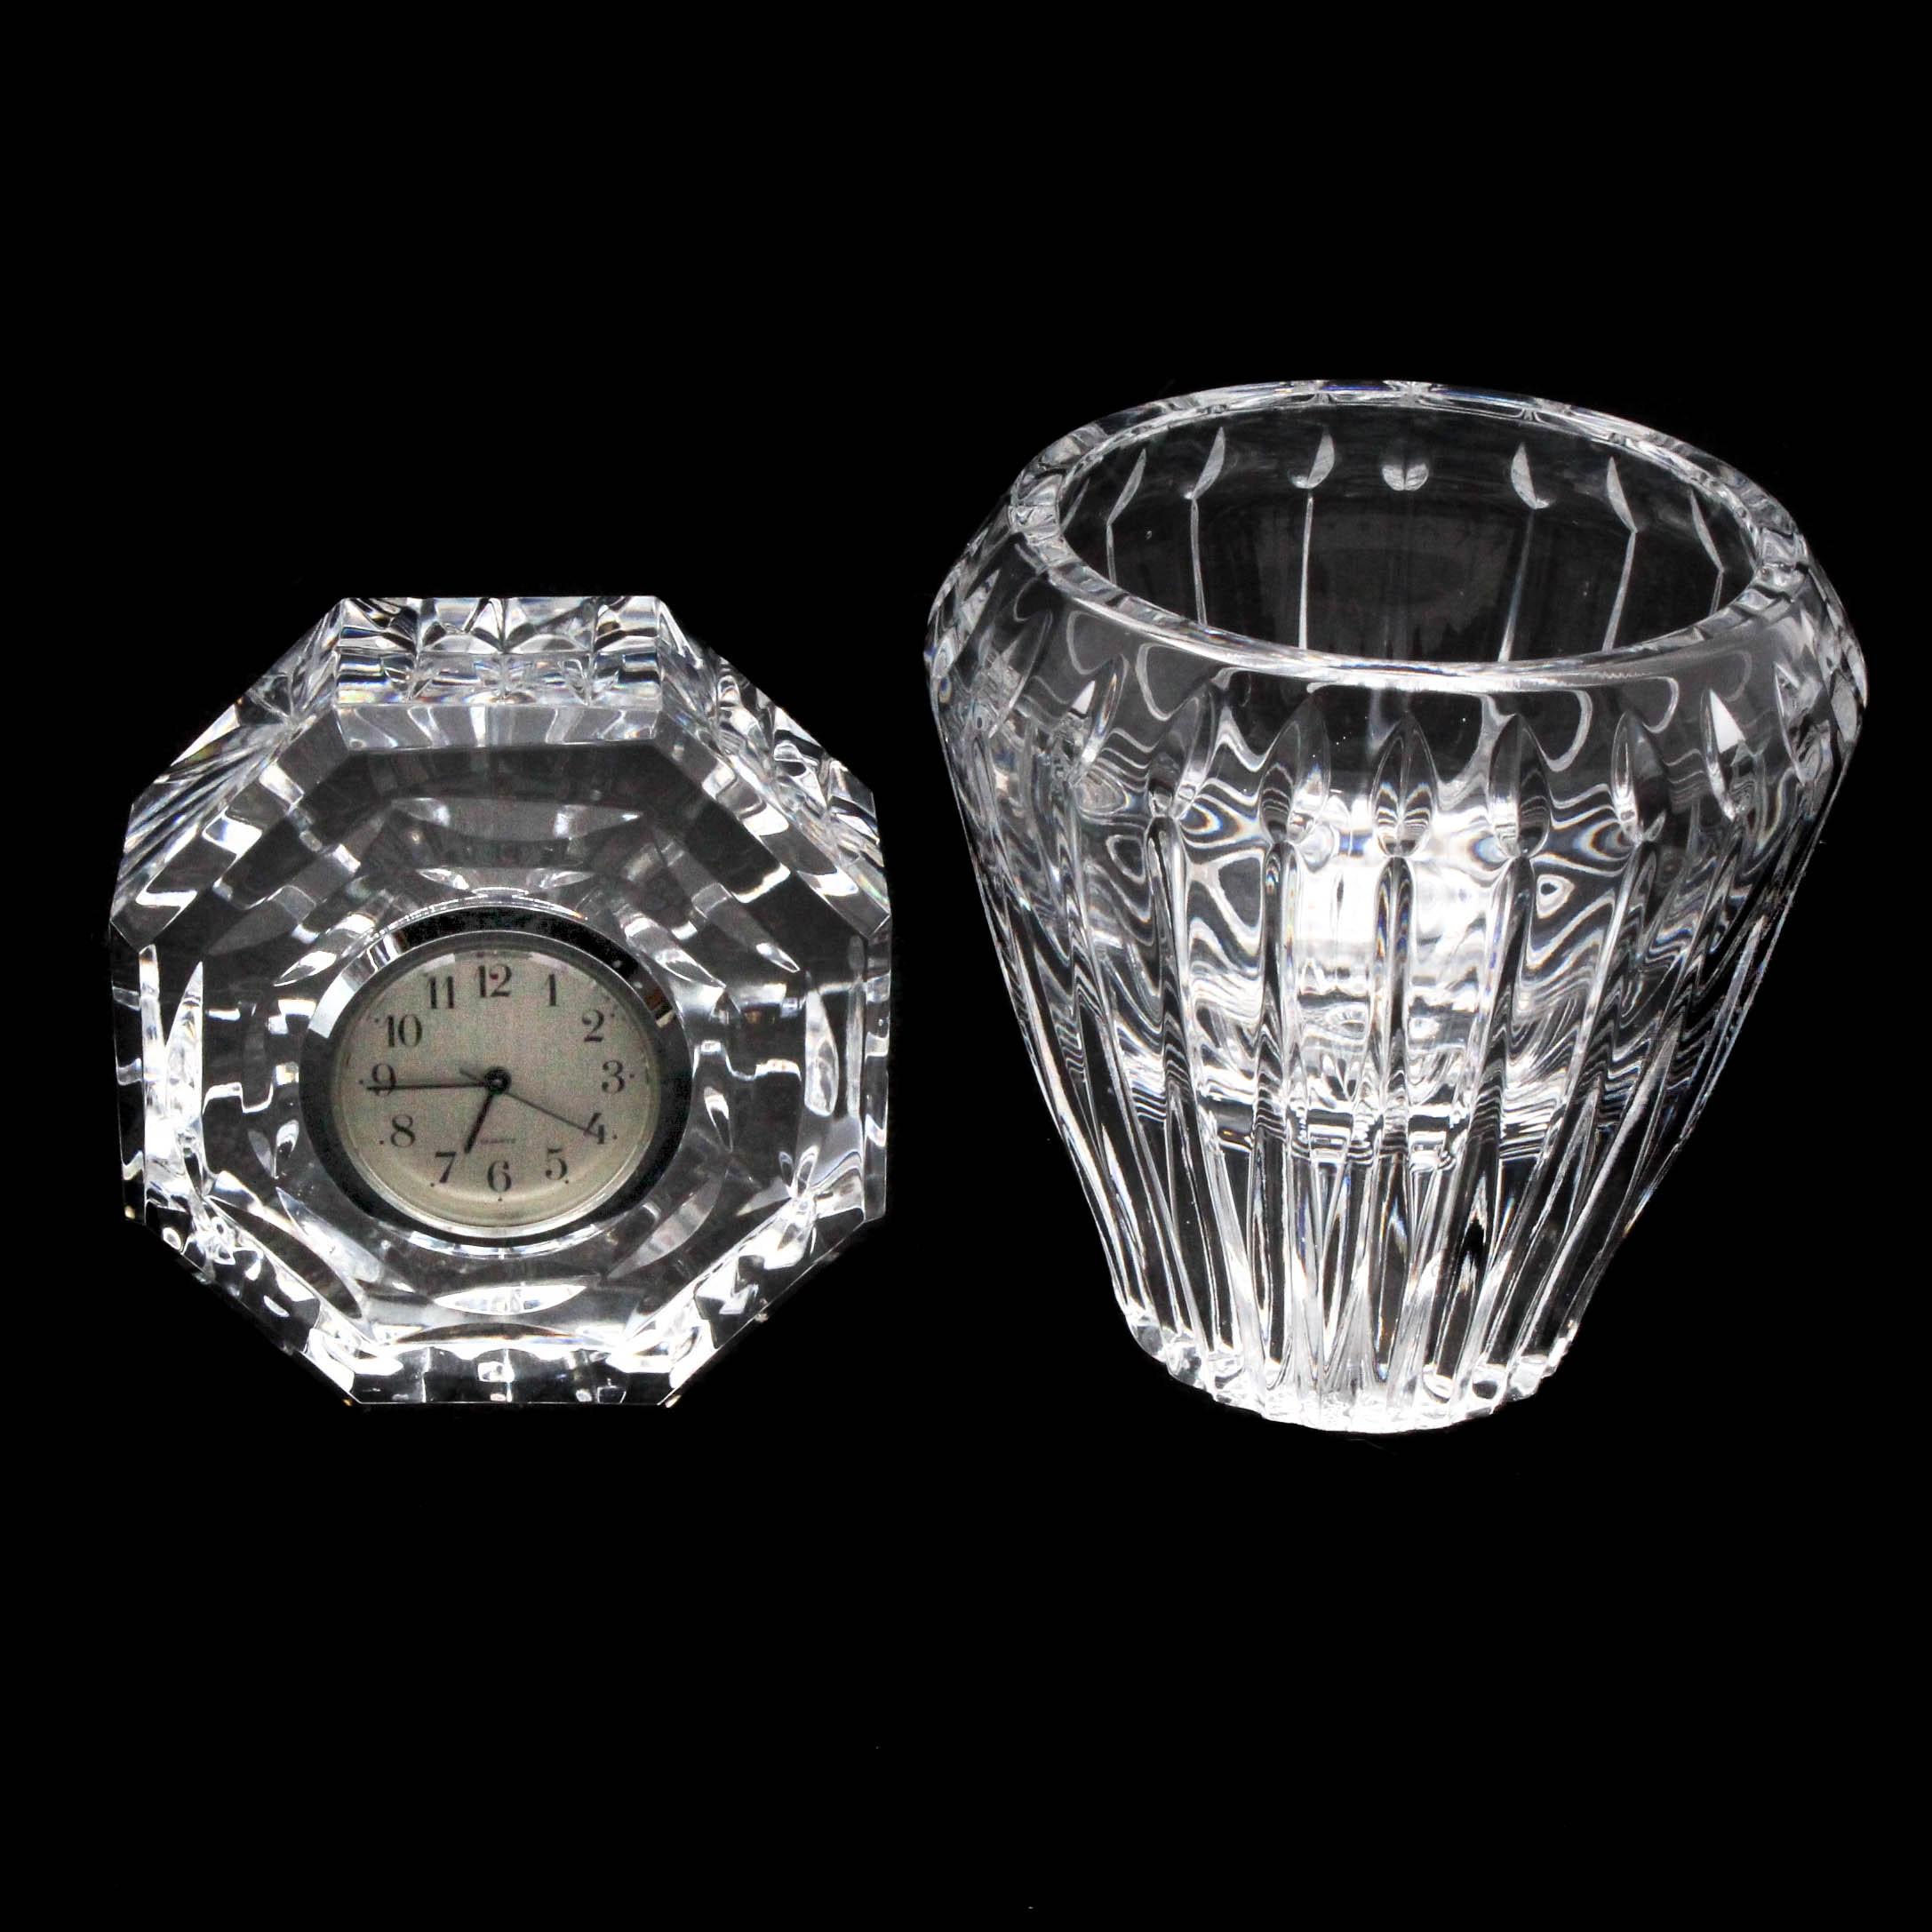 Waterford Crystal Desk Clock and Block Votive Holder